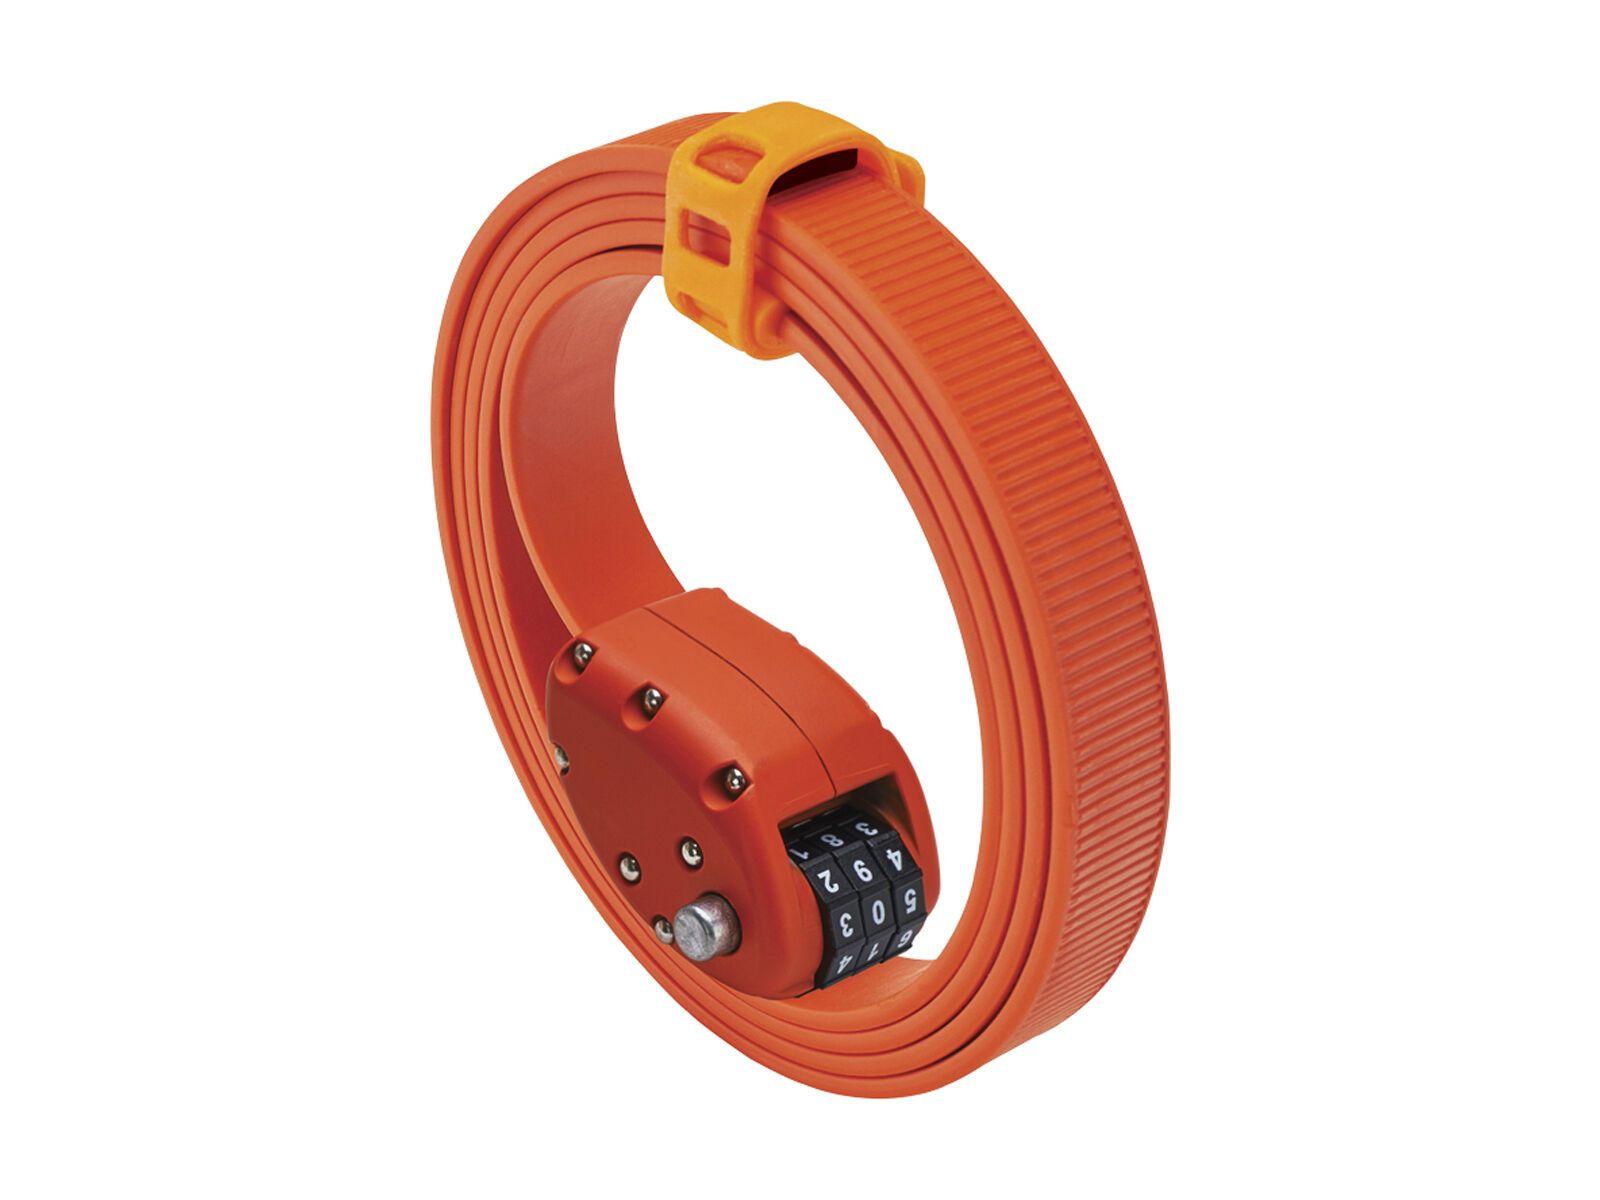 Otto DesignWorks Ottolock Cinch Lock - 152 cm, otto orange - Fahrradschloss 202049